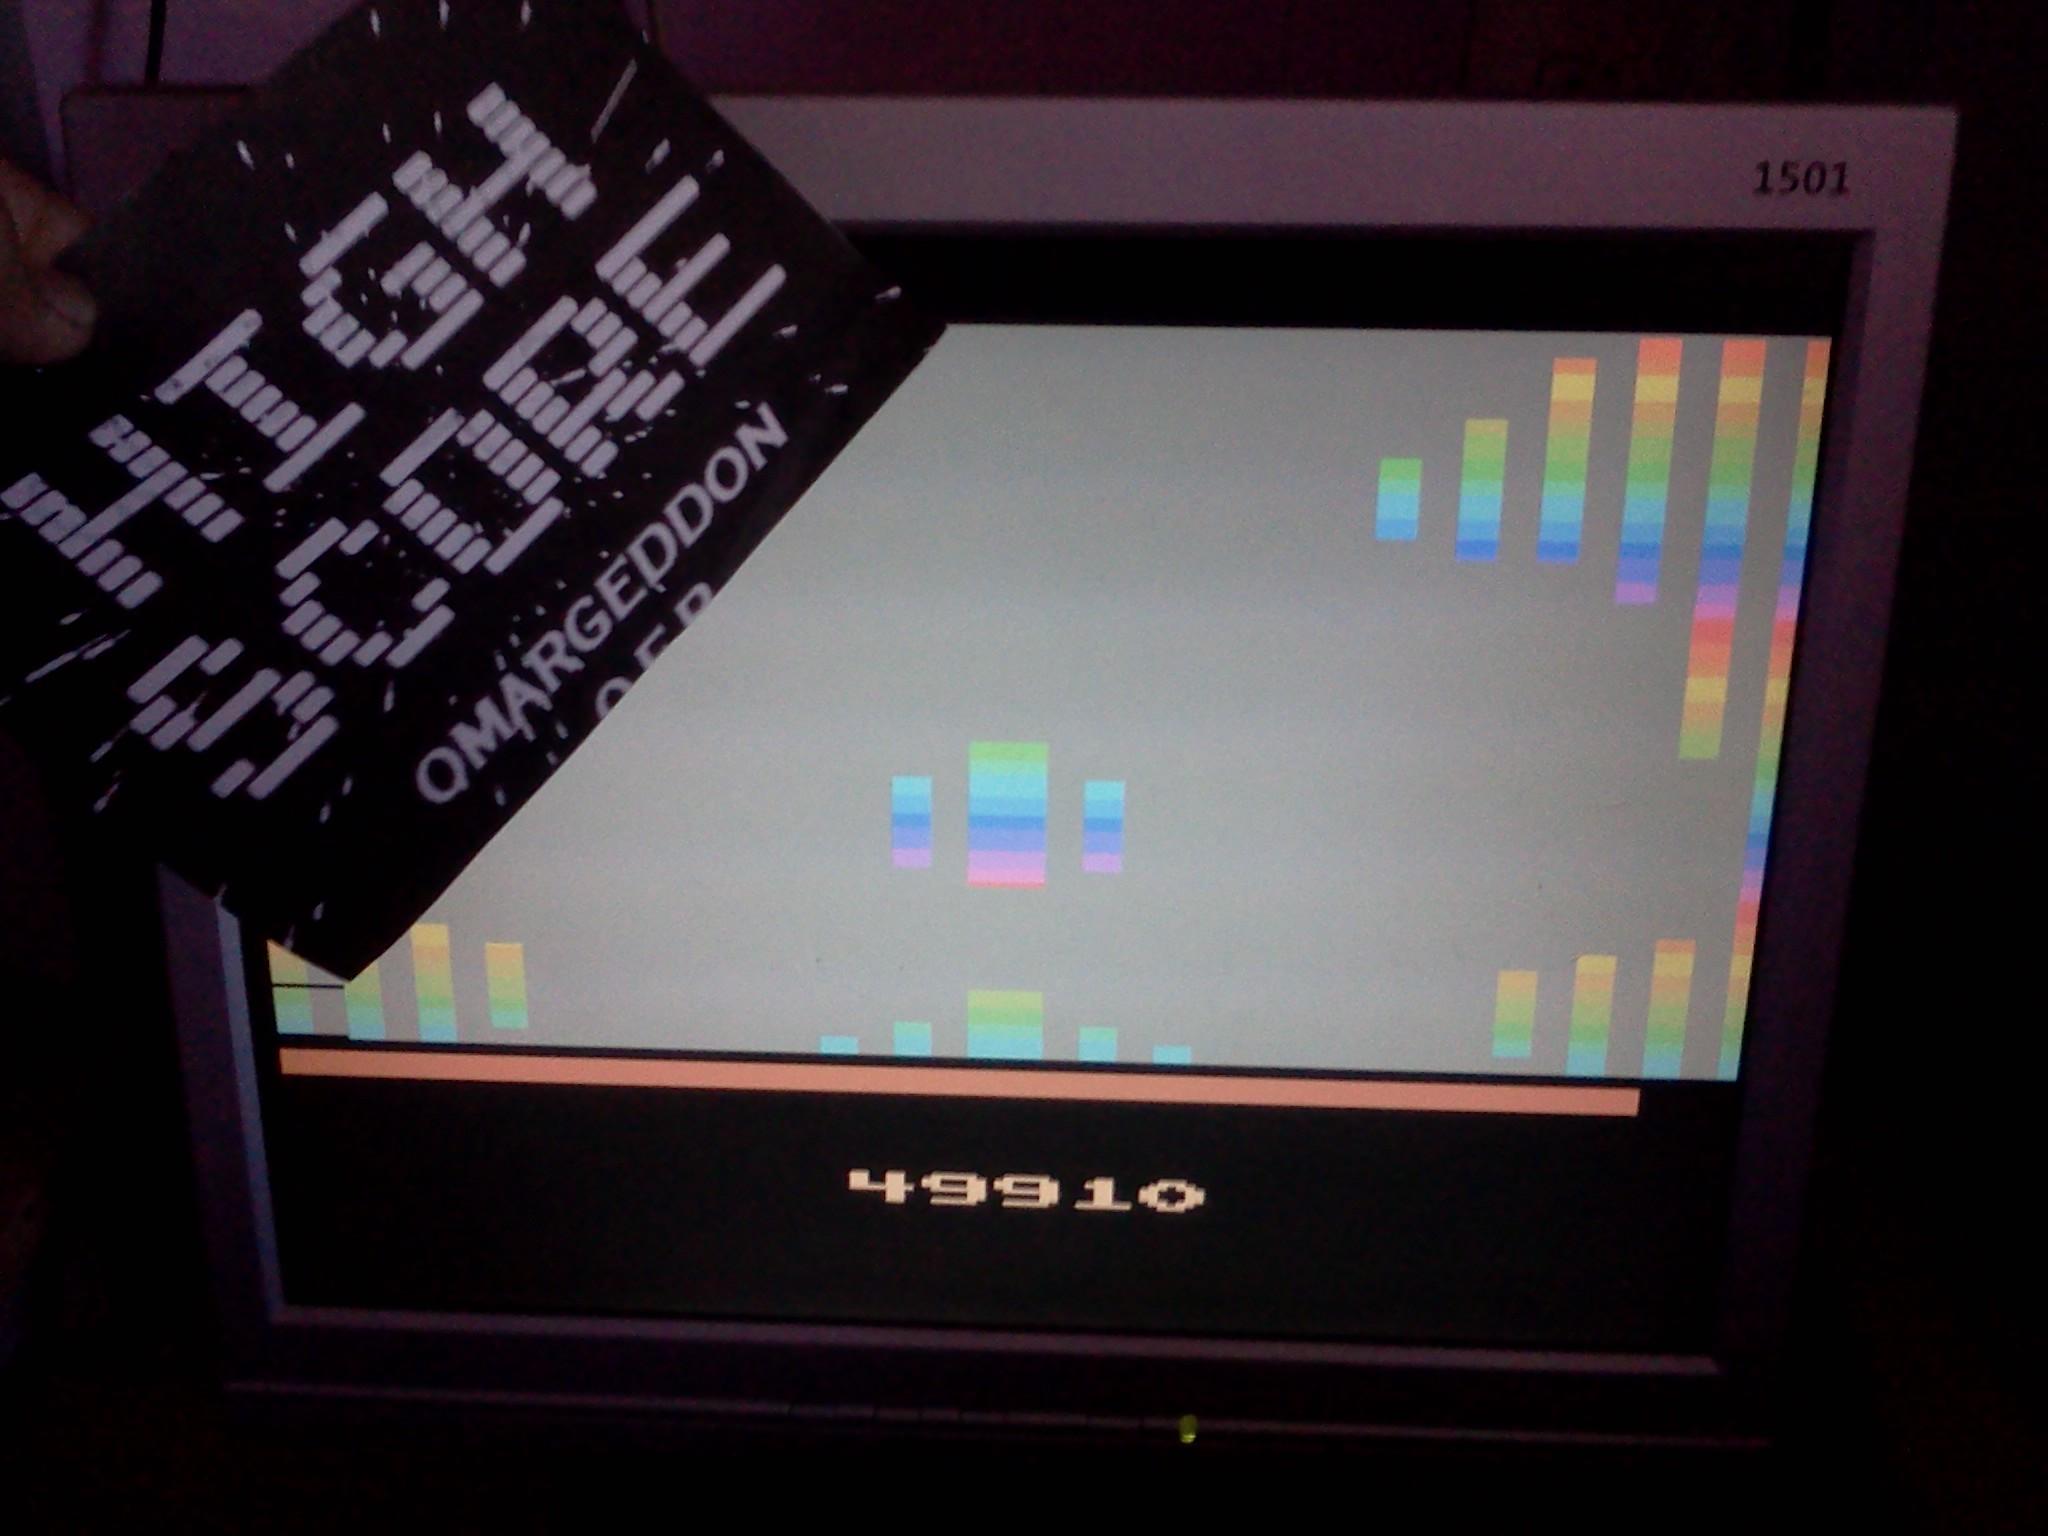 omargeddon: Vanguard (Atari 2600 Emulated Novice/B Mode) 49,910 points on 2016-08-27 12:49:43